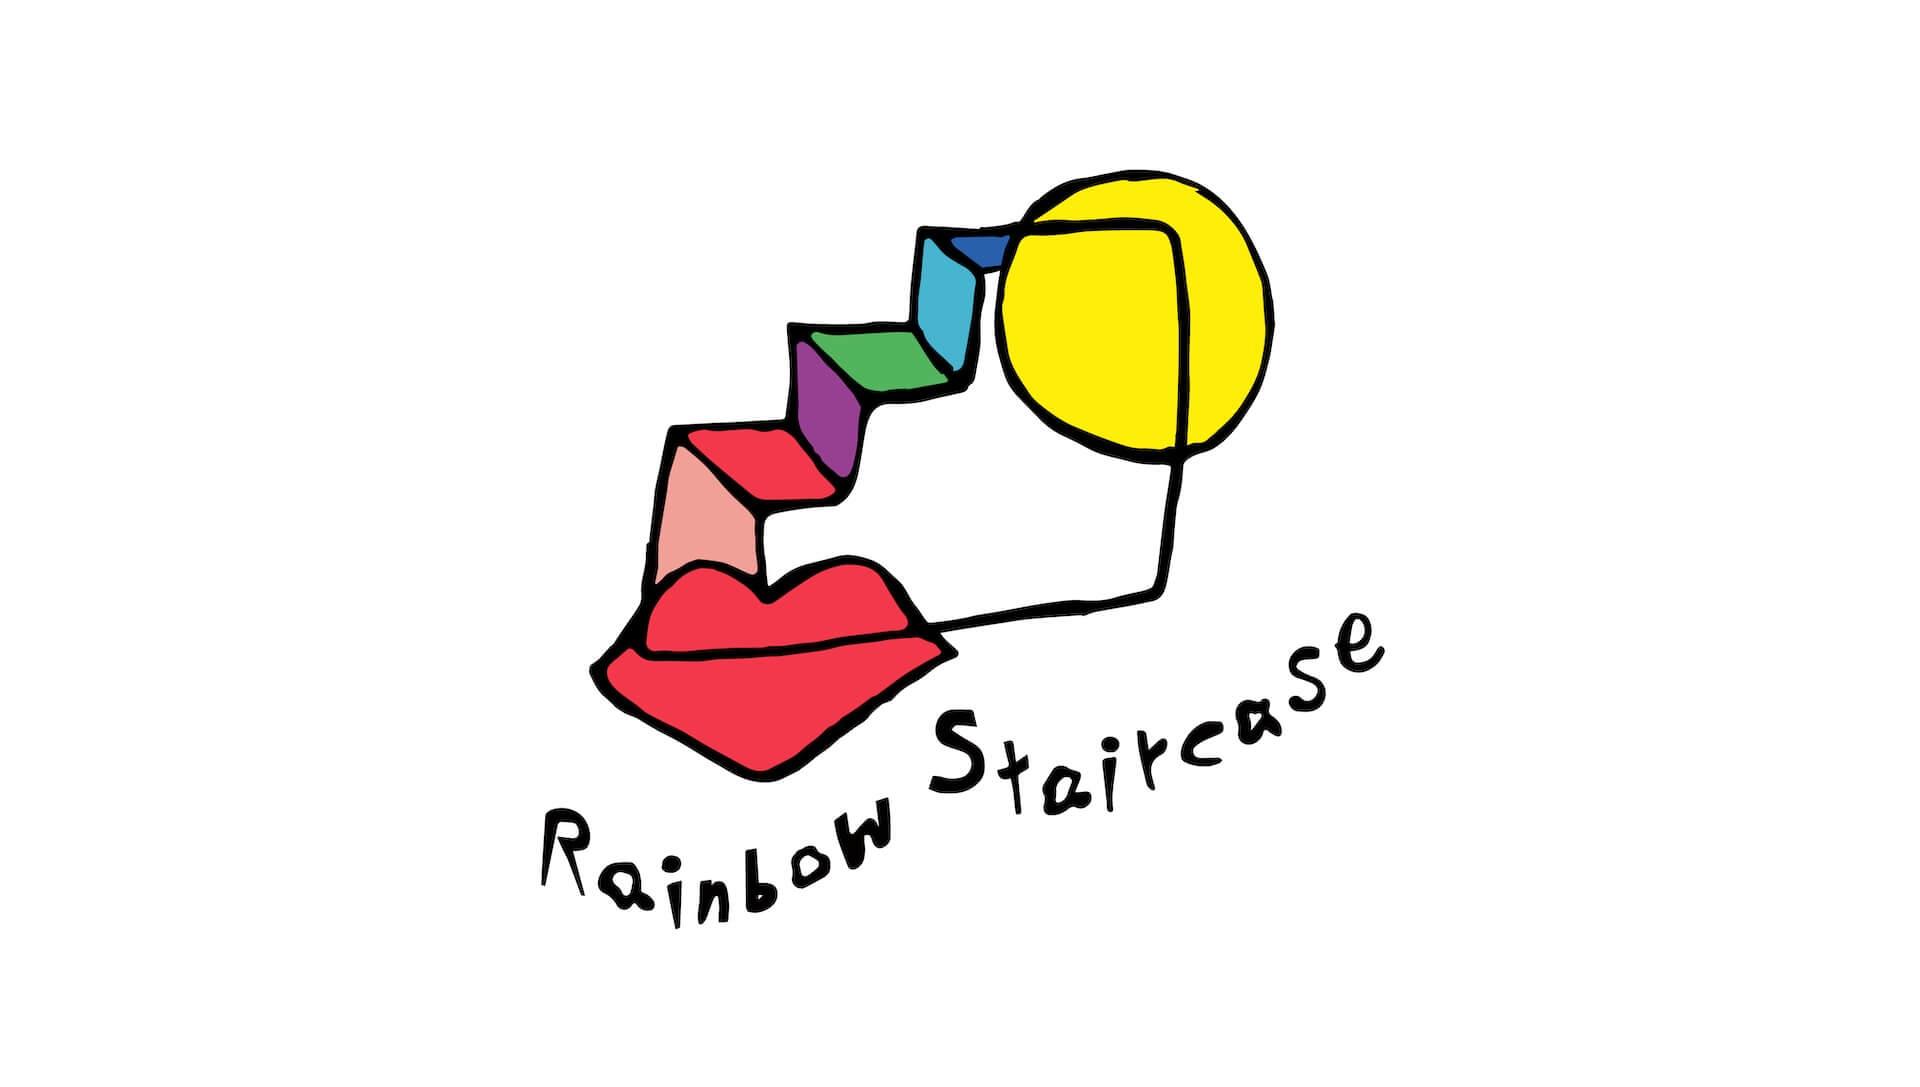 Charaの配信プログラム「Rainbow Staircase」のティザー映像が公開!イマチケでのライブ配信も決定 music200601_chara_rainbowstaircase_03